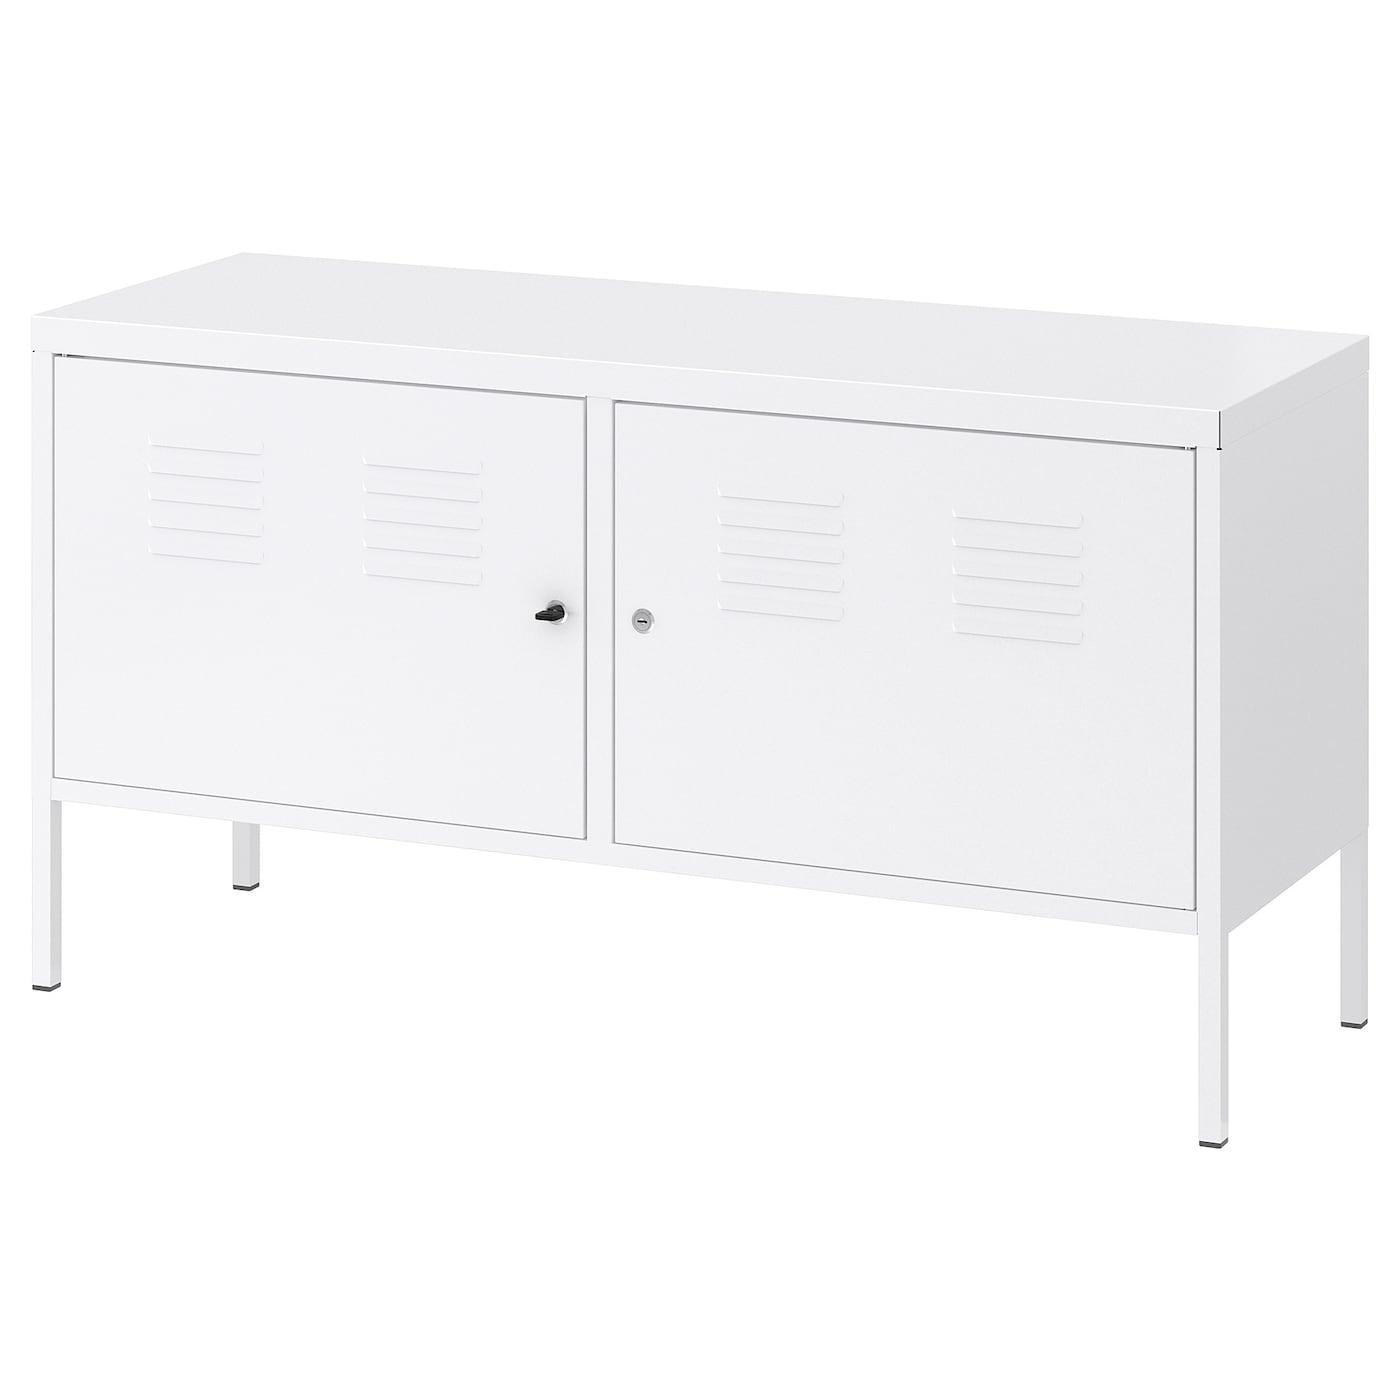 Ikea Ps Armoire Metallique Blanc 119x63cm Ikea Canada Ikea